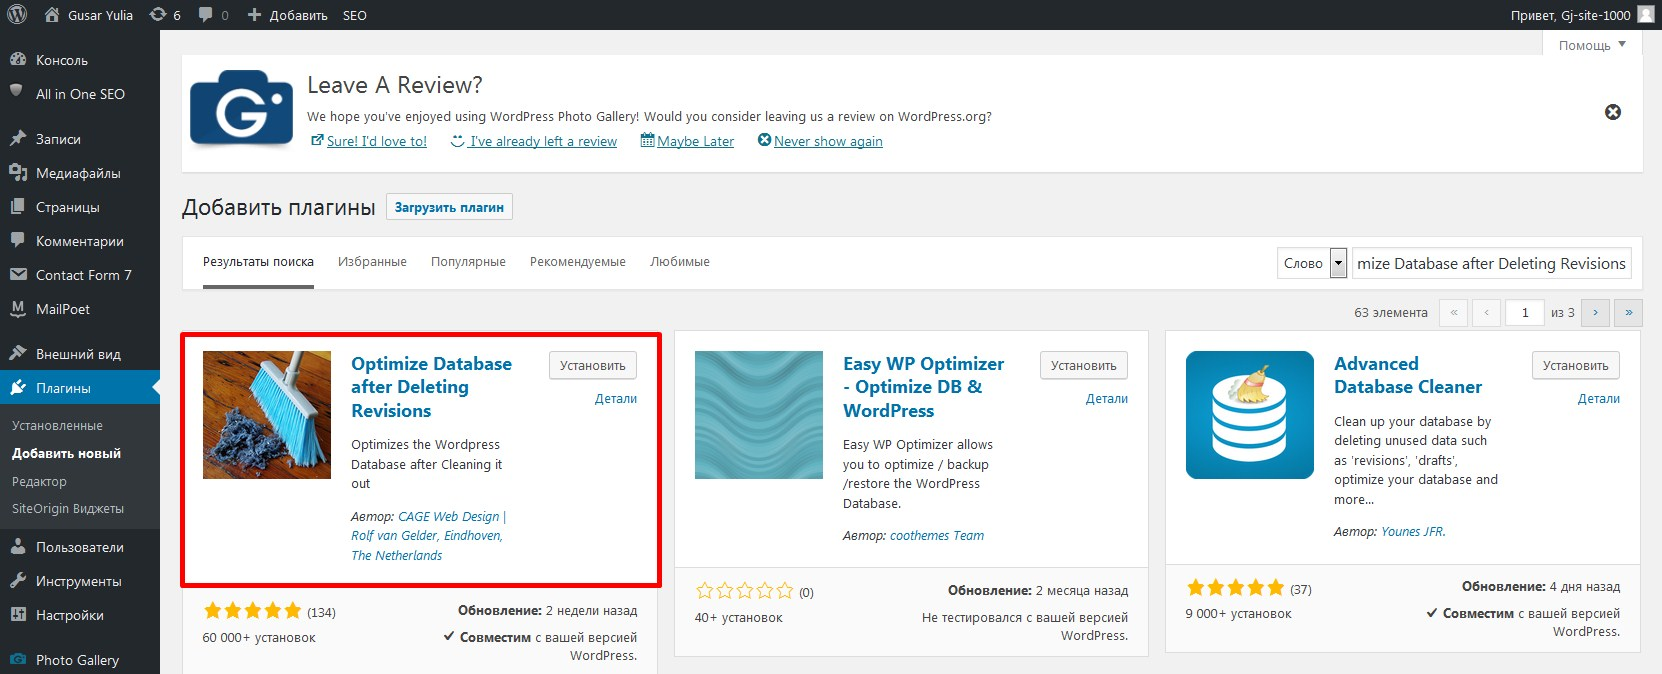 установка плагина Optimize Database